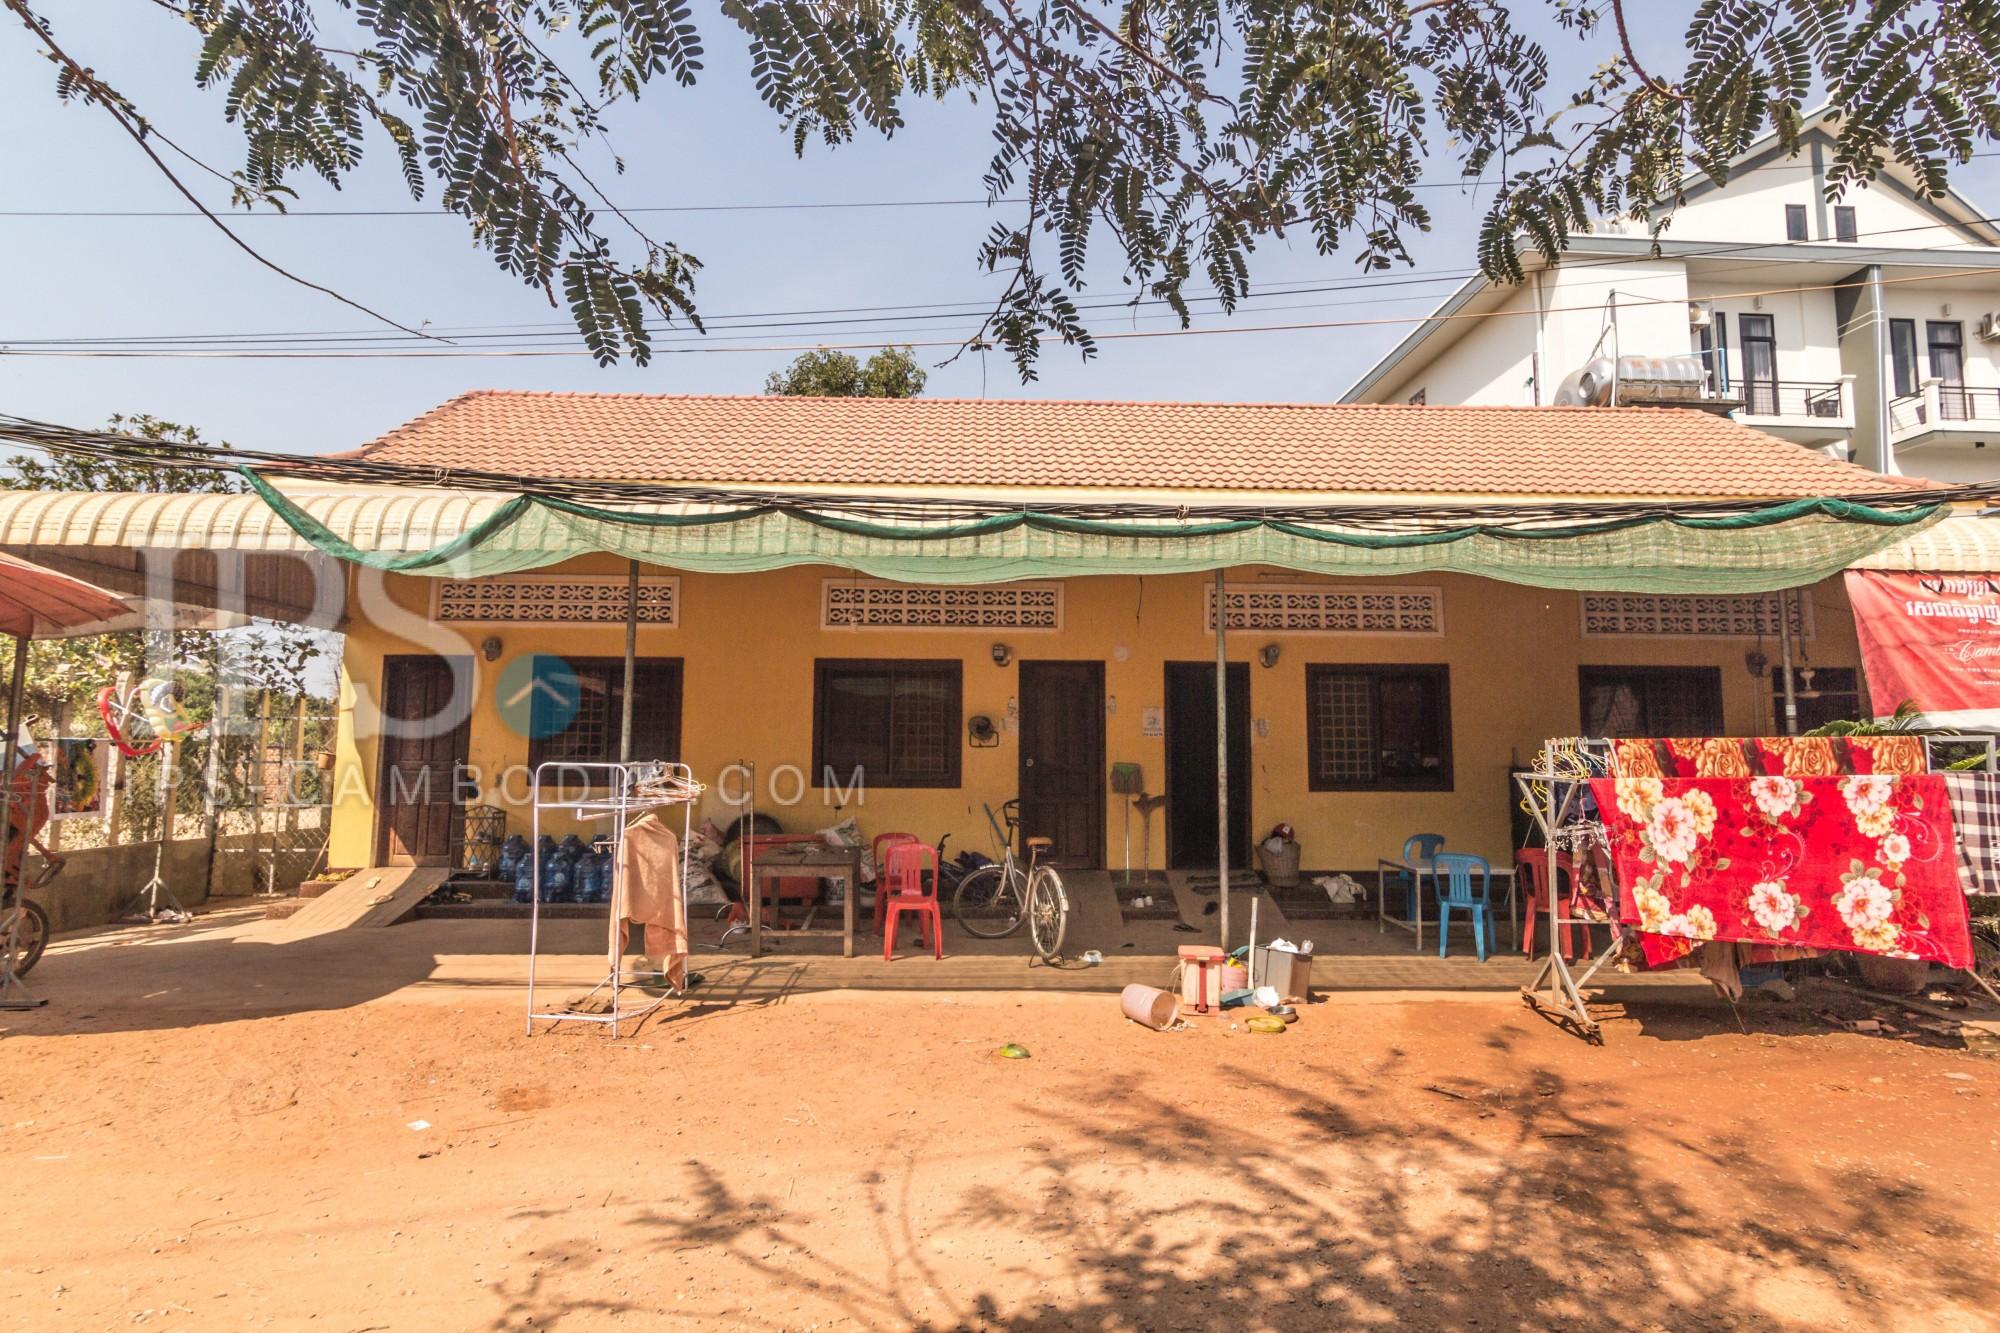 286 Sqm Residential Land For Sale - Svay Dangkum, Siem Reap